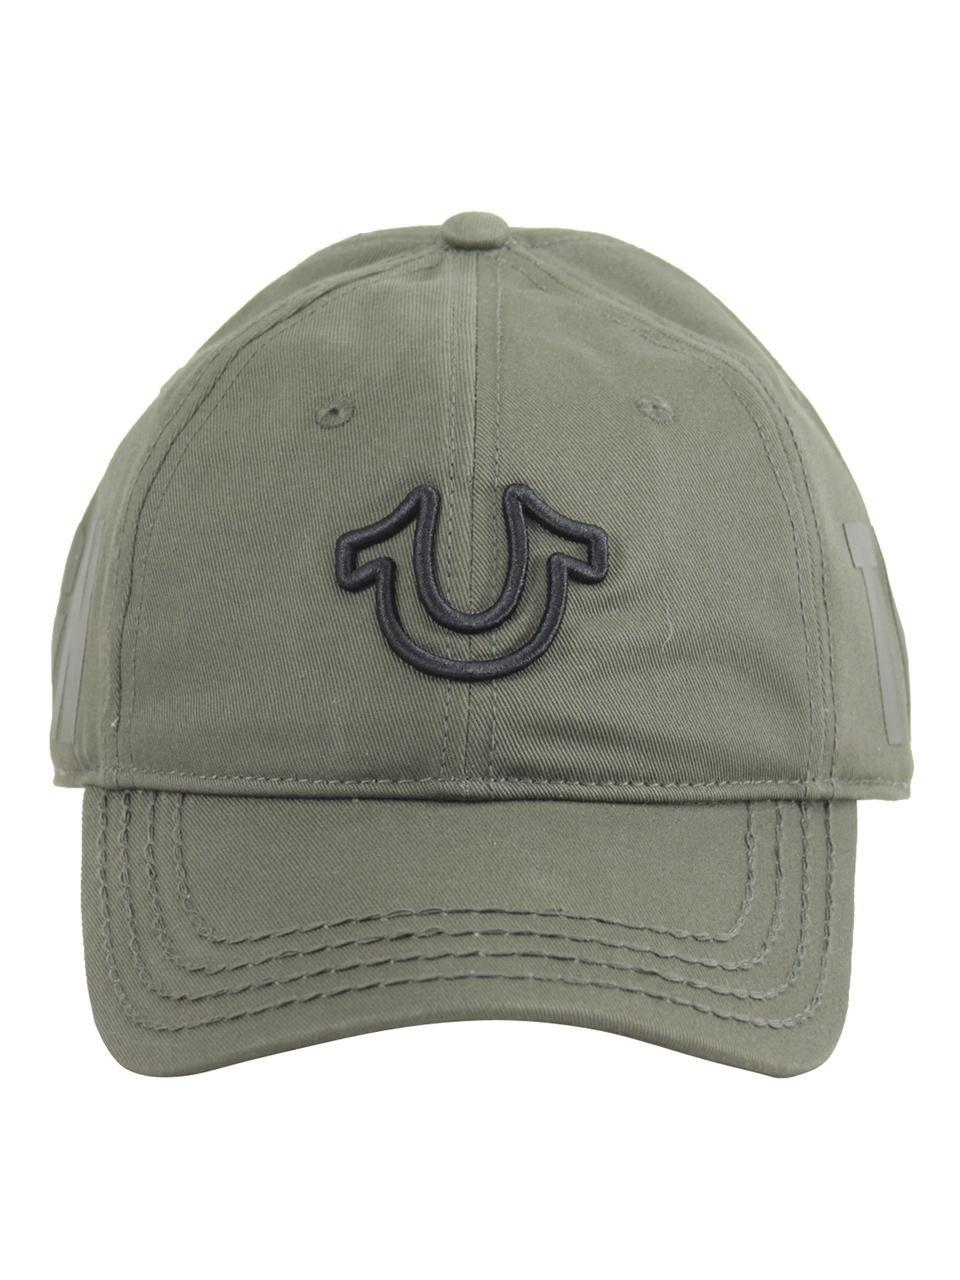 81b945db True Religion Men's 3D Horseshoe Cotton Strapback Baseball Cap Hat